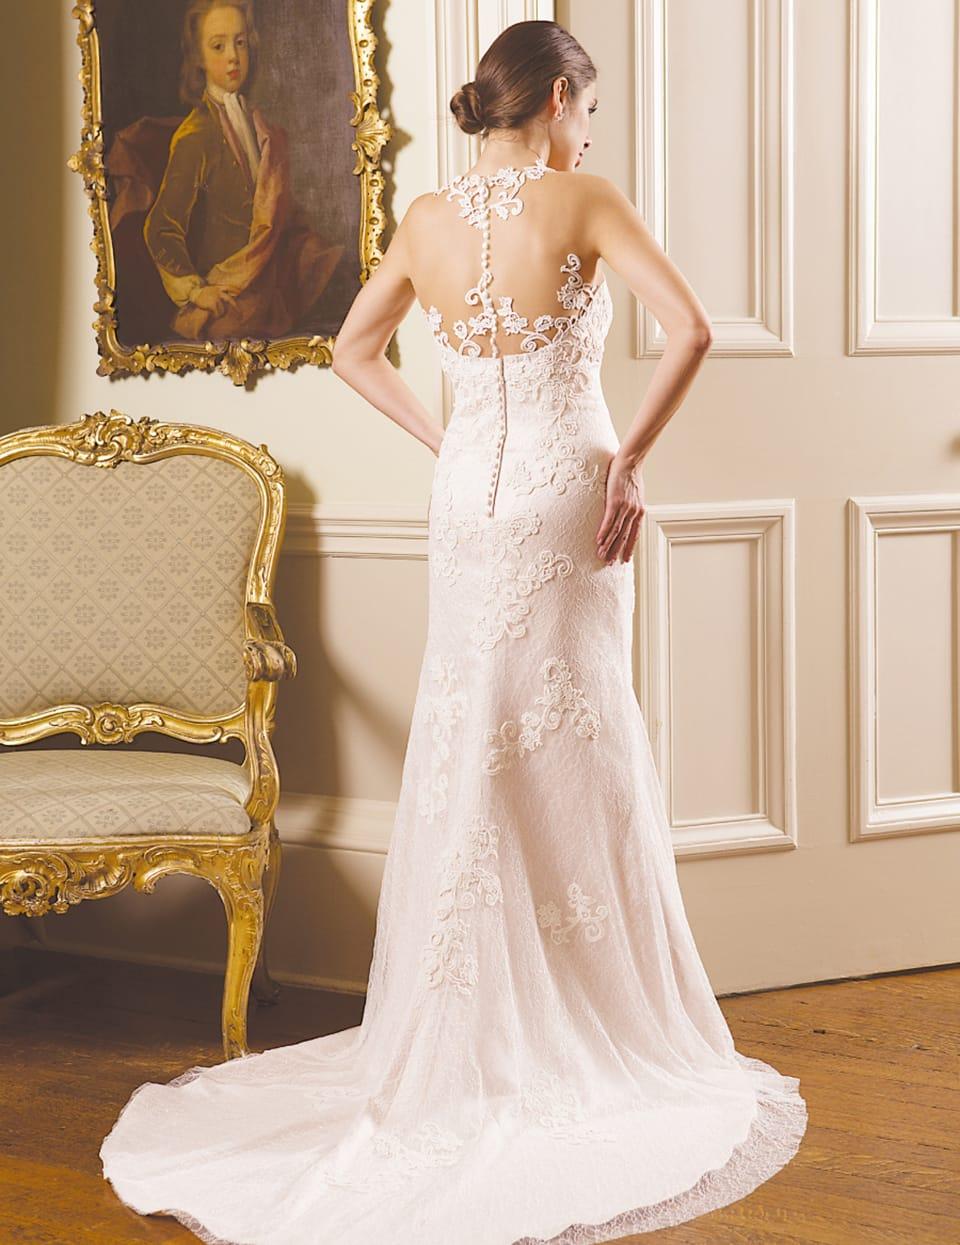 Sacha James D1455 Wedding Dress Sell My Wedding Dress Online Sell My Wedd